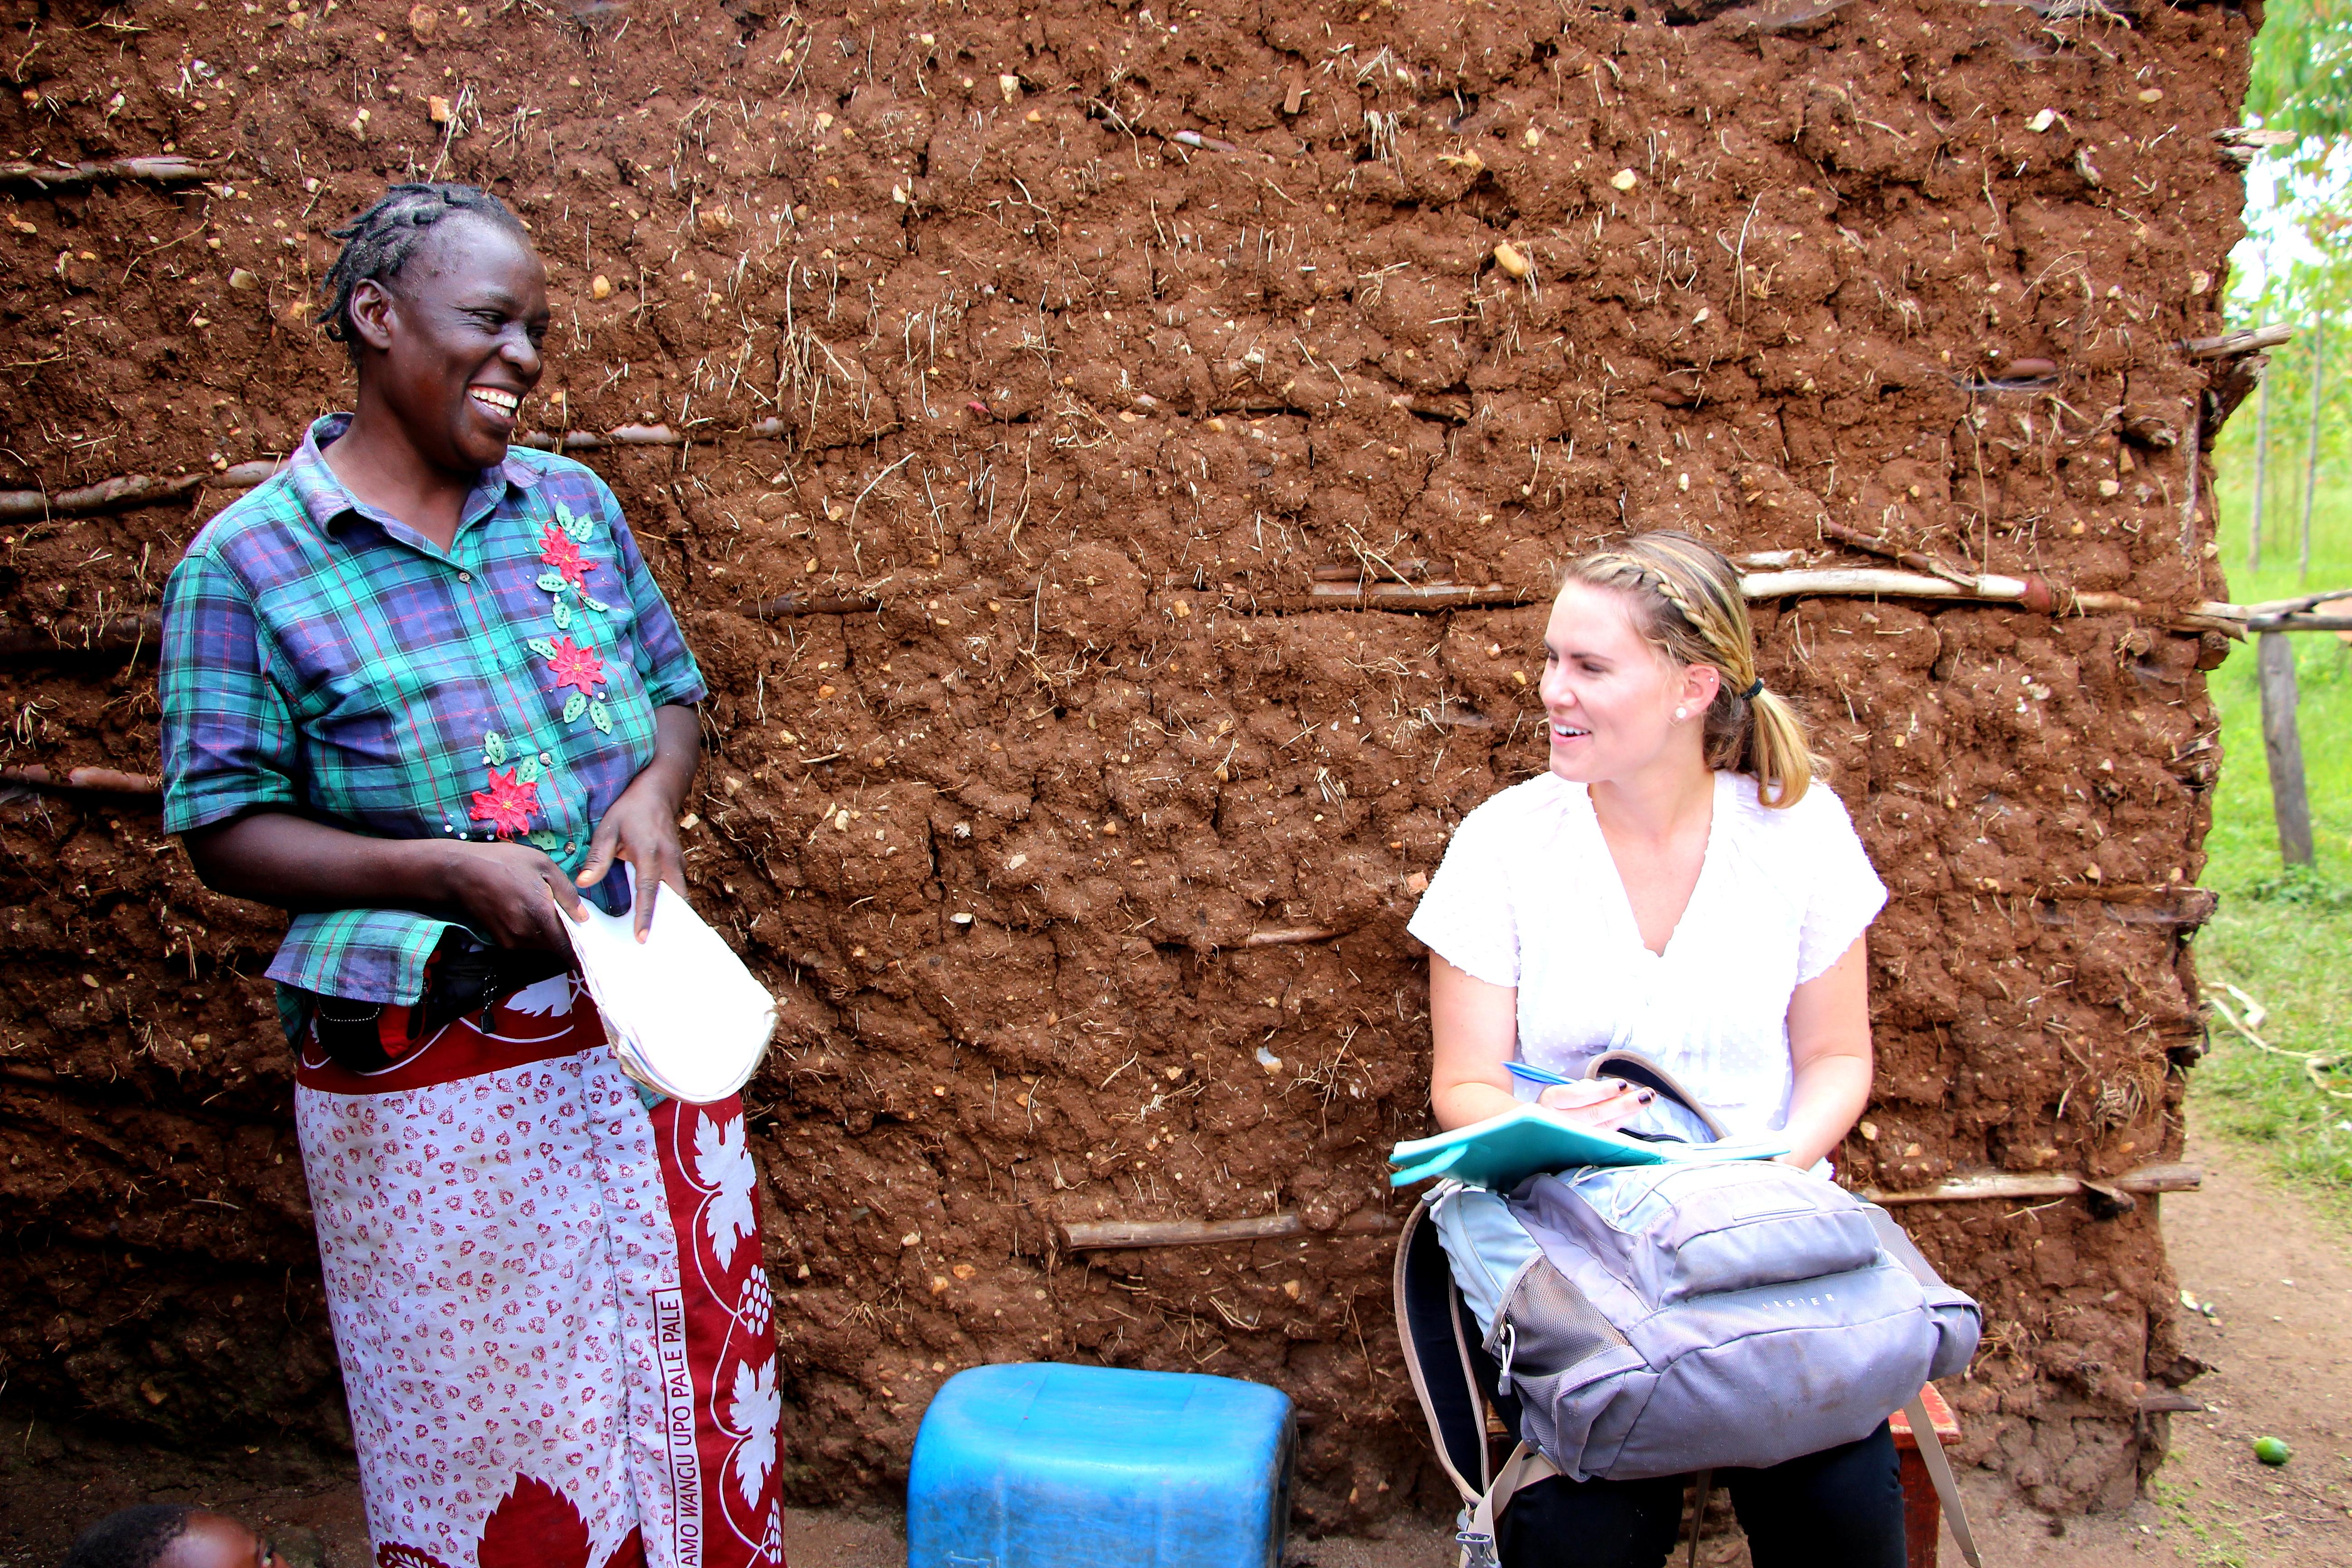 Heidi Graves interviewing Mary Nabwera in Sabwani, Kenya.